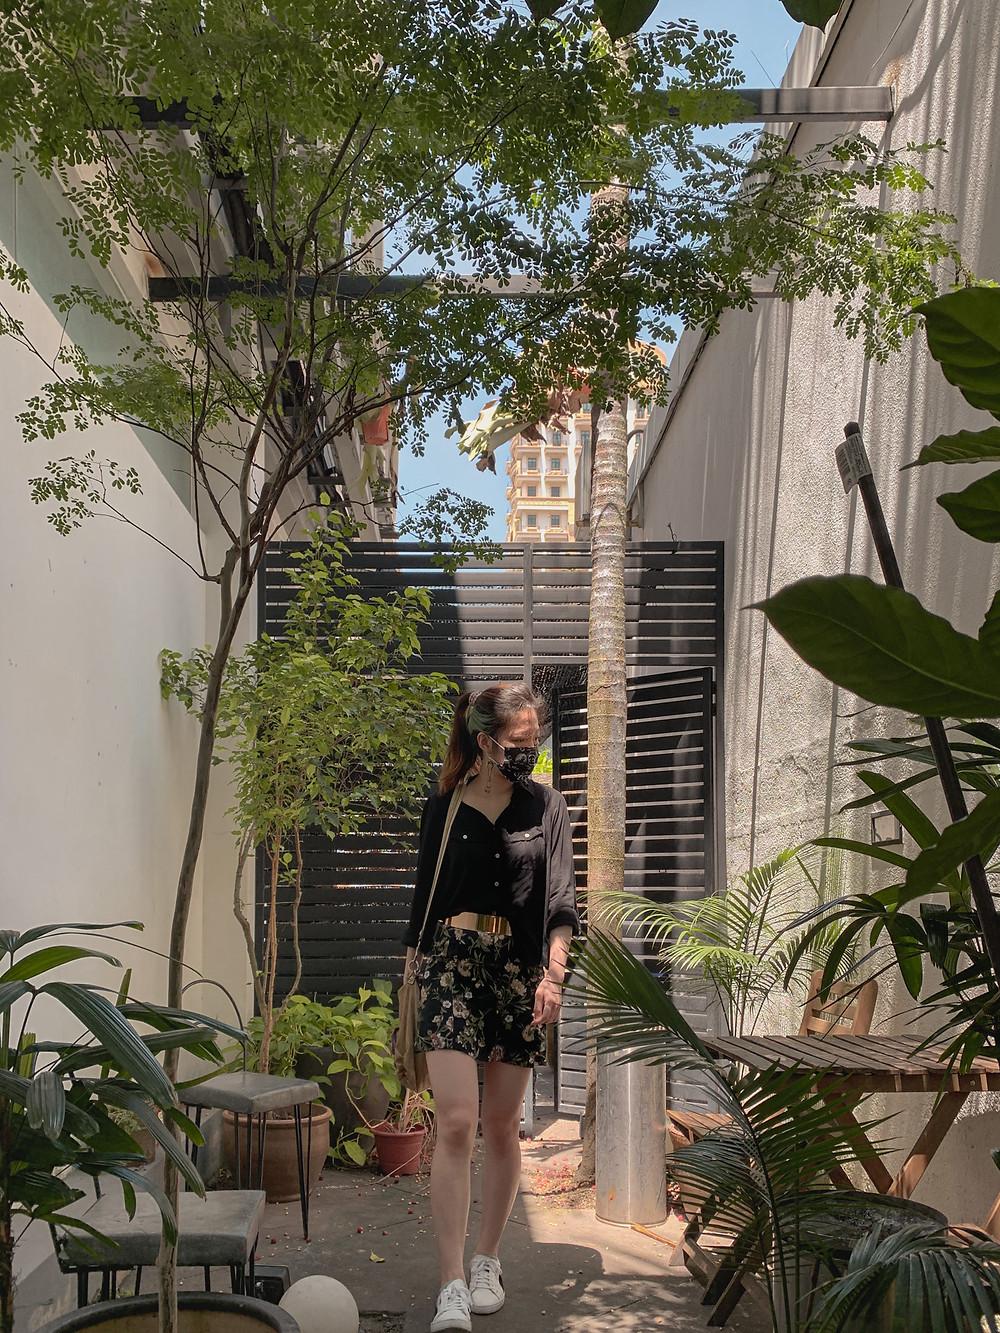 Style blogger in black shirt, gold metal belt, black floral skirt, white sneakers / RollingBear Travels.